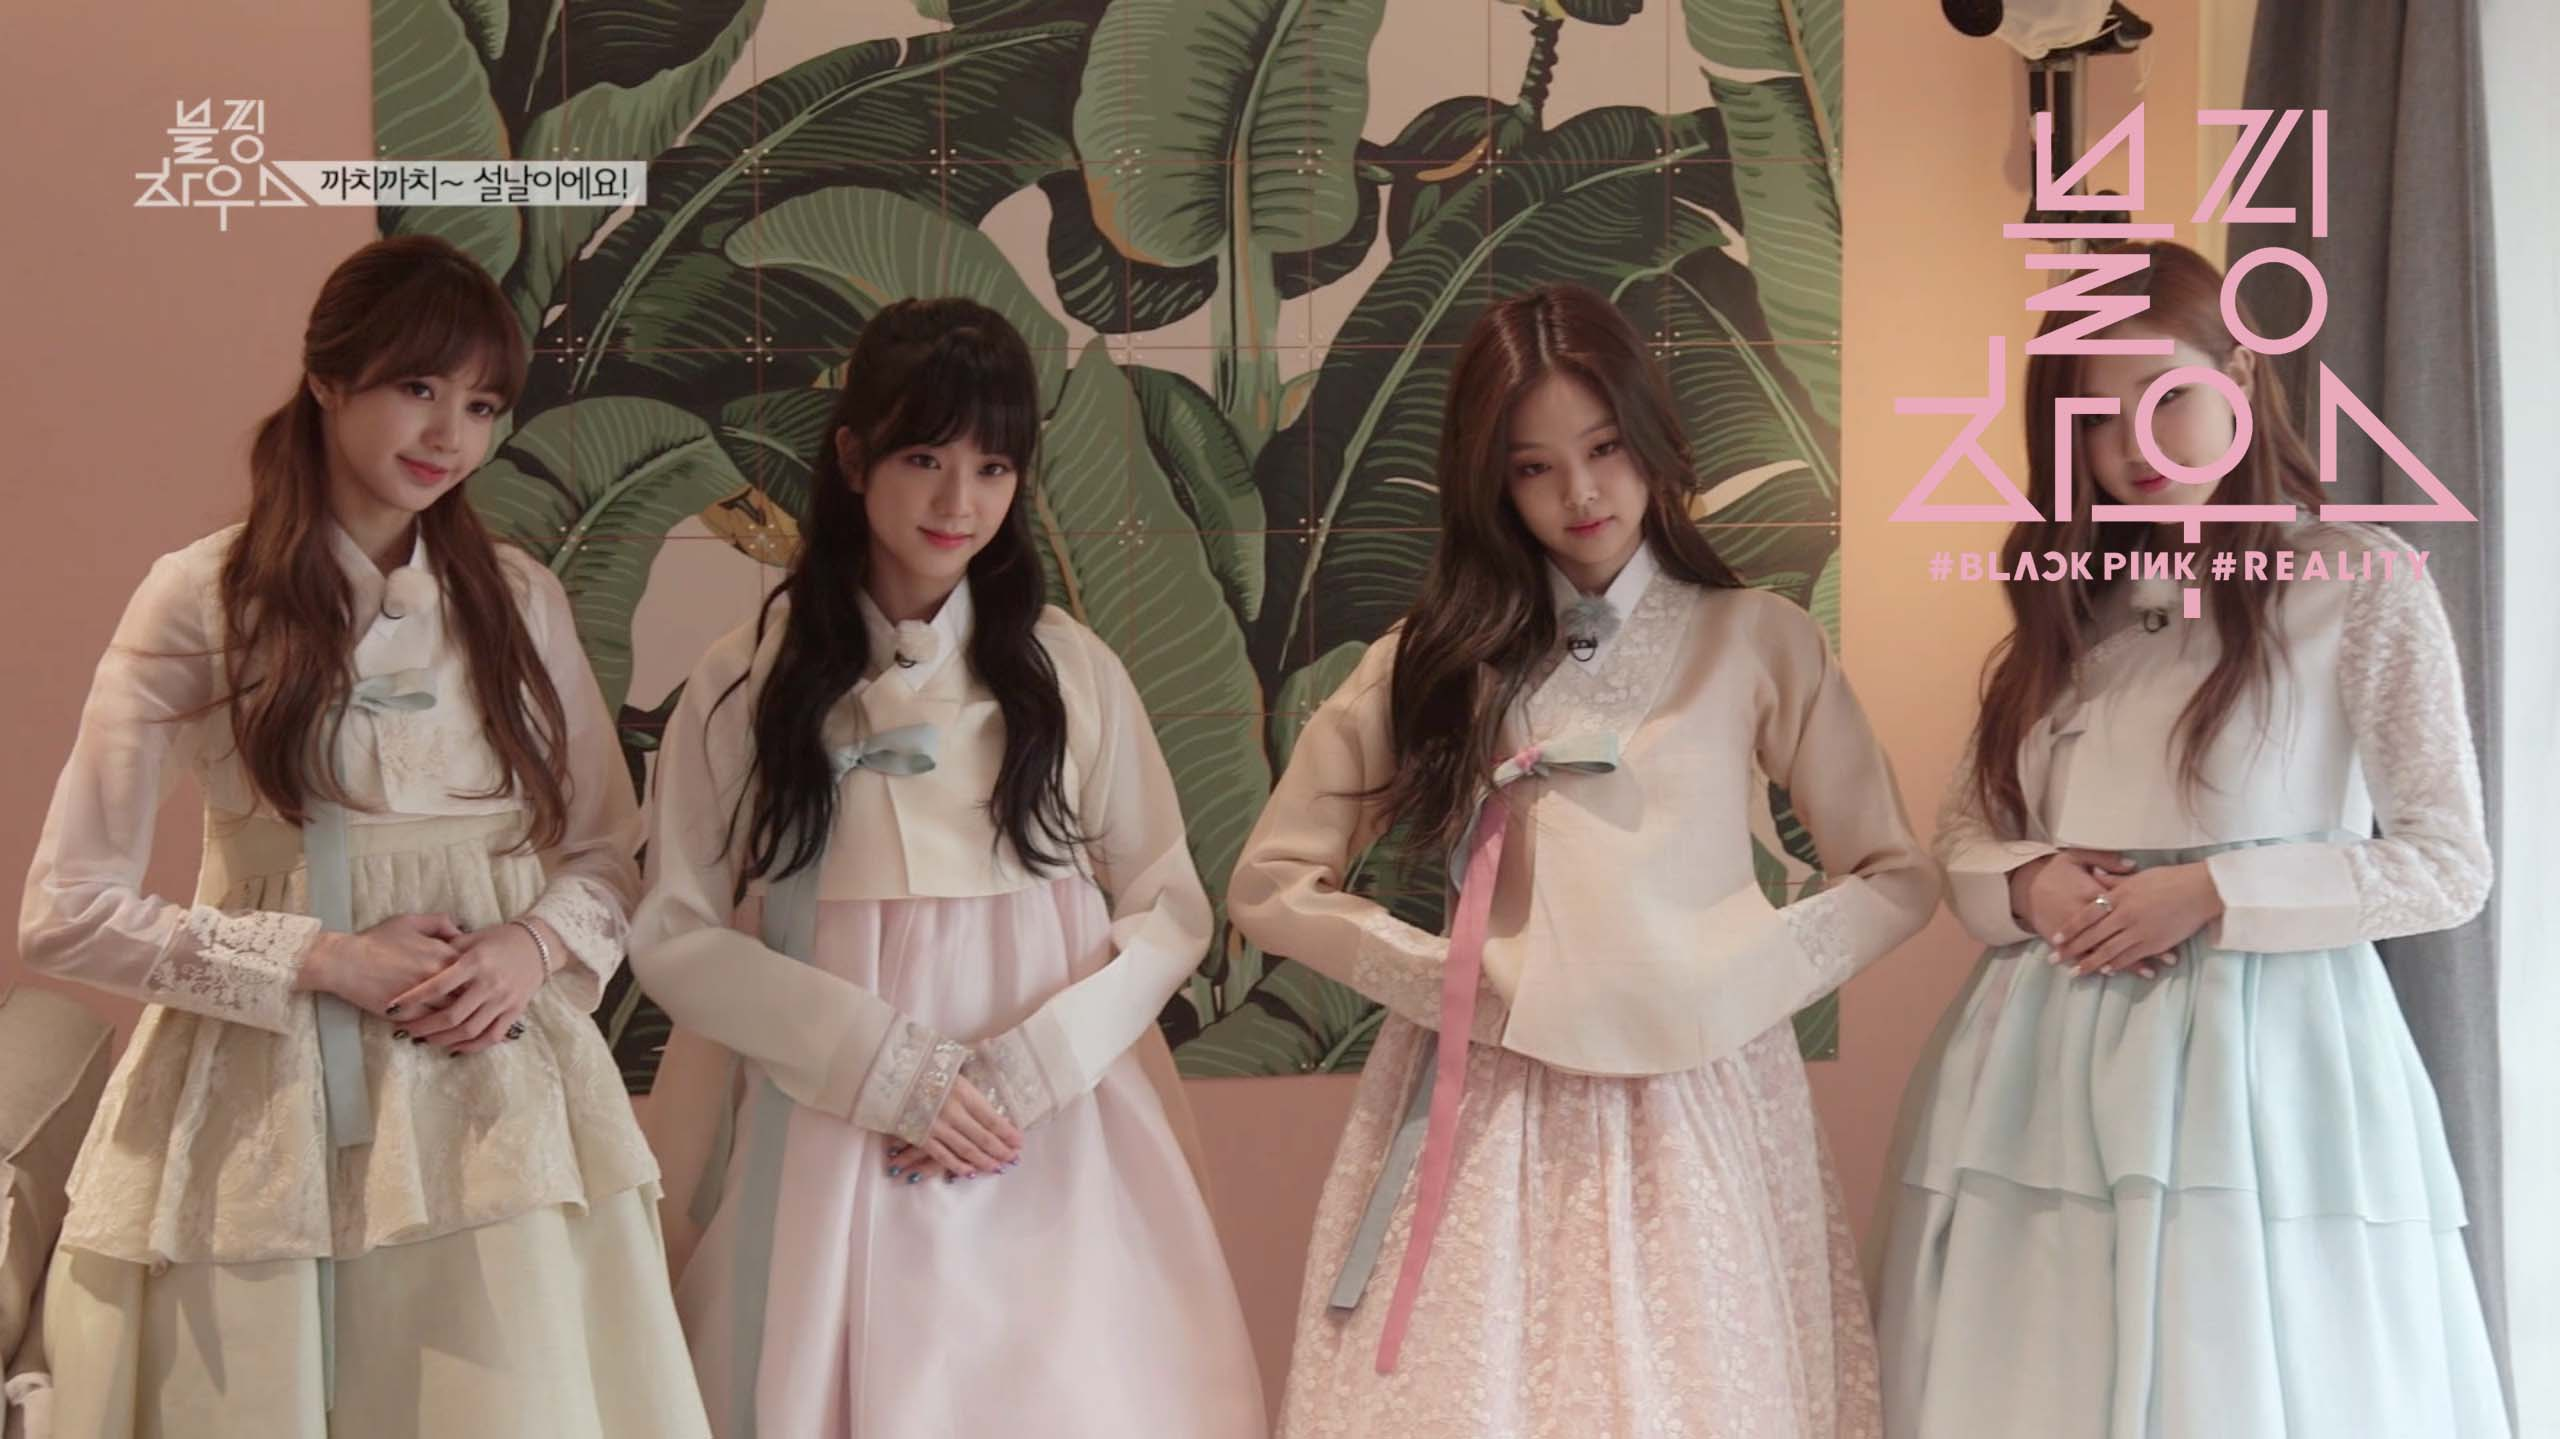 BLACKPINK wearing Hanbok